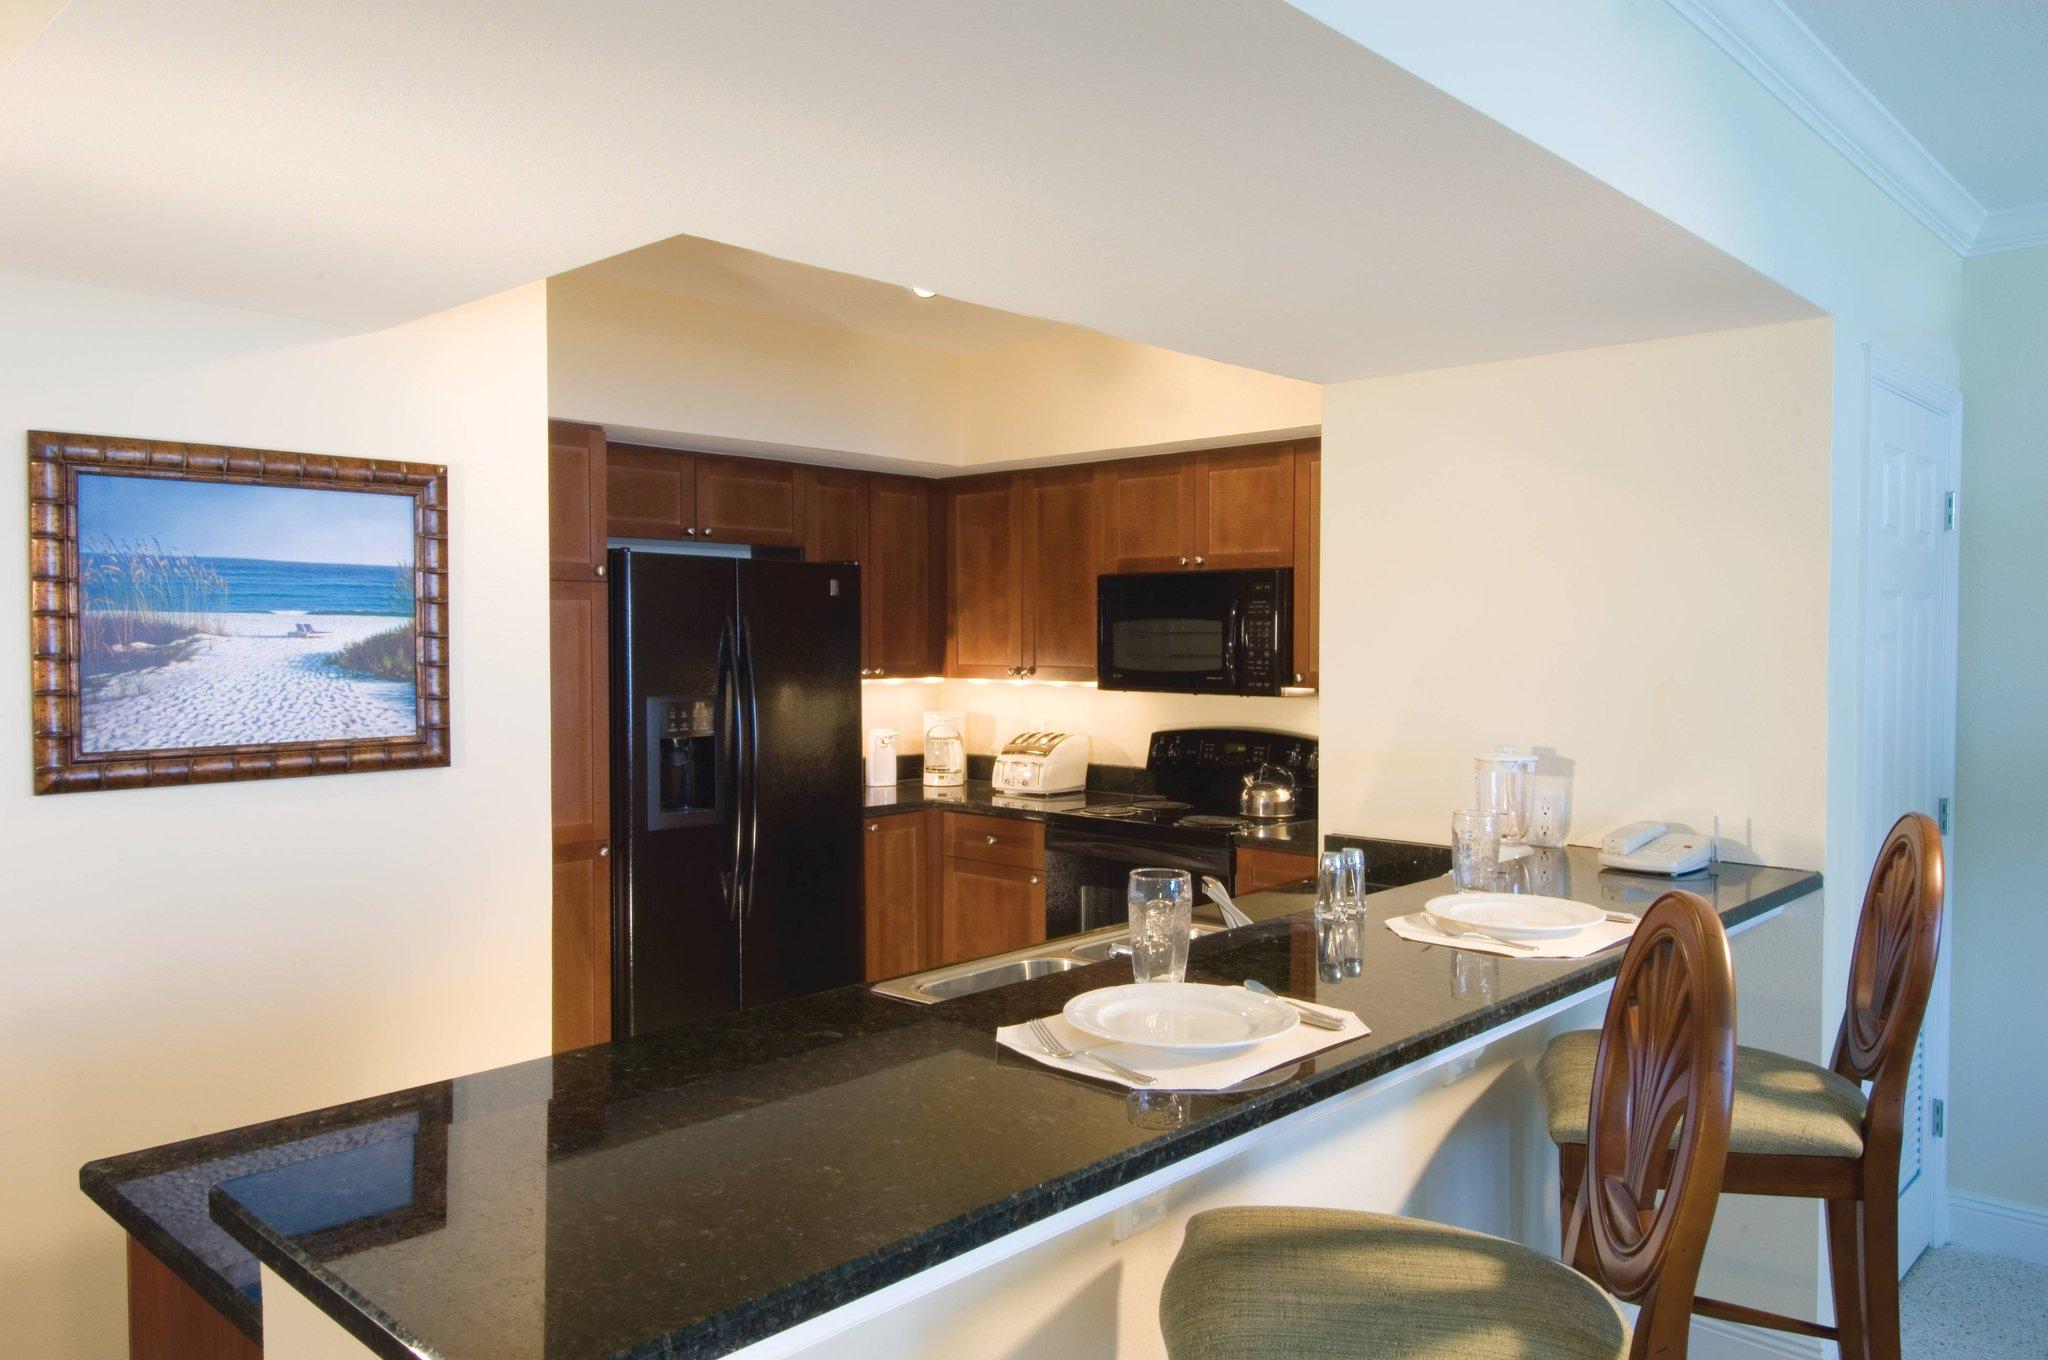 wyndham vacation resorts panama city beach wyndham vacation one bedroom standard kitchen